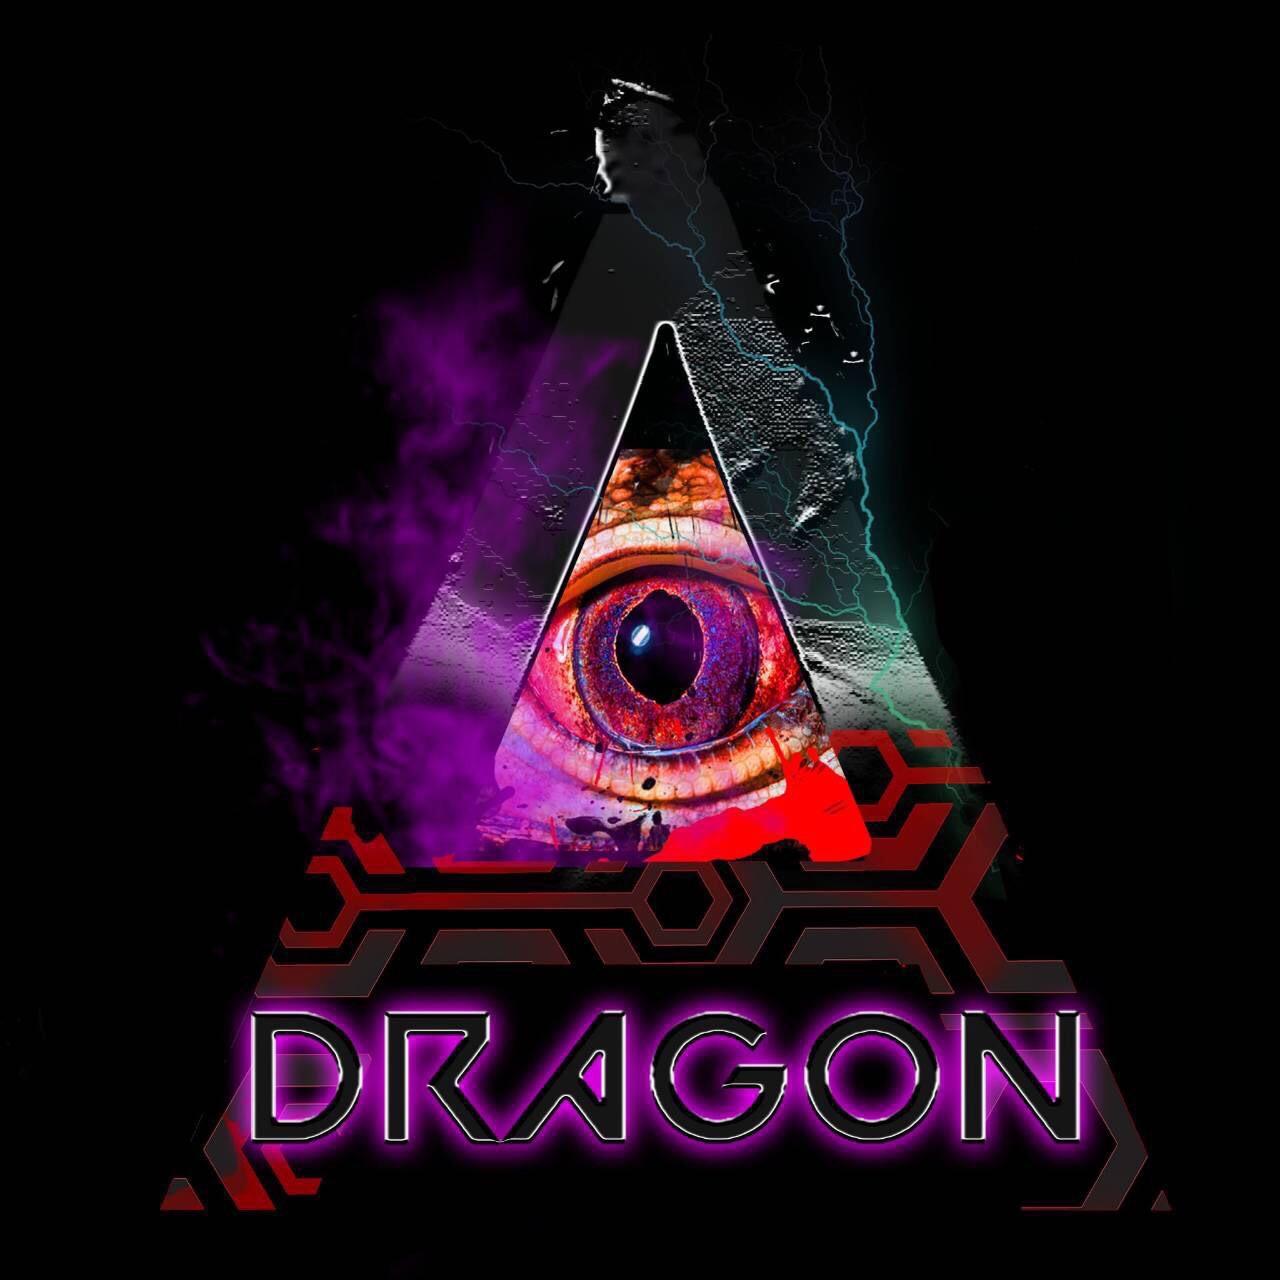 DRAGON(OP DJ)/テラスパンパンス/Non-Holic OPENING ACT:Anna /MAYA/詩乃渚│STEP NEO STEP #SNS